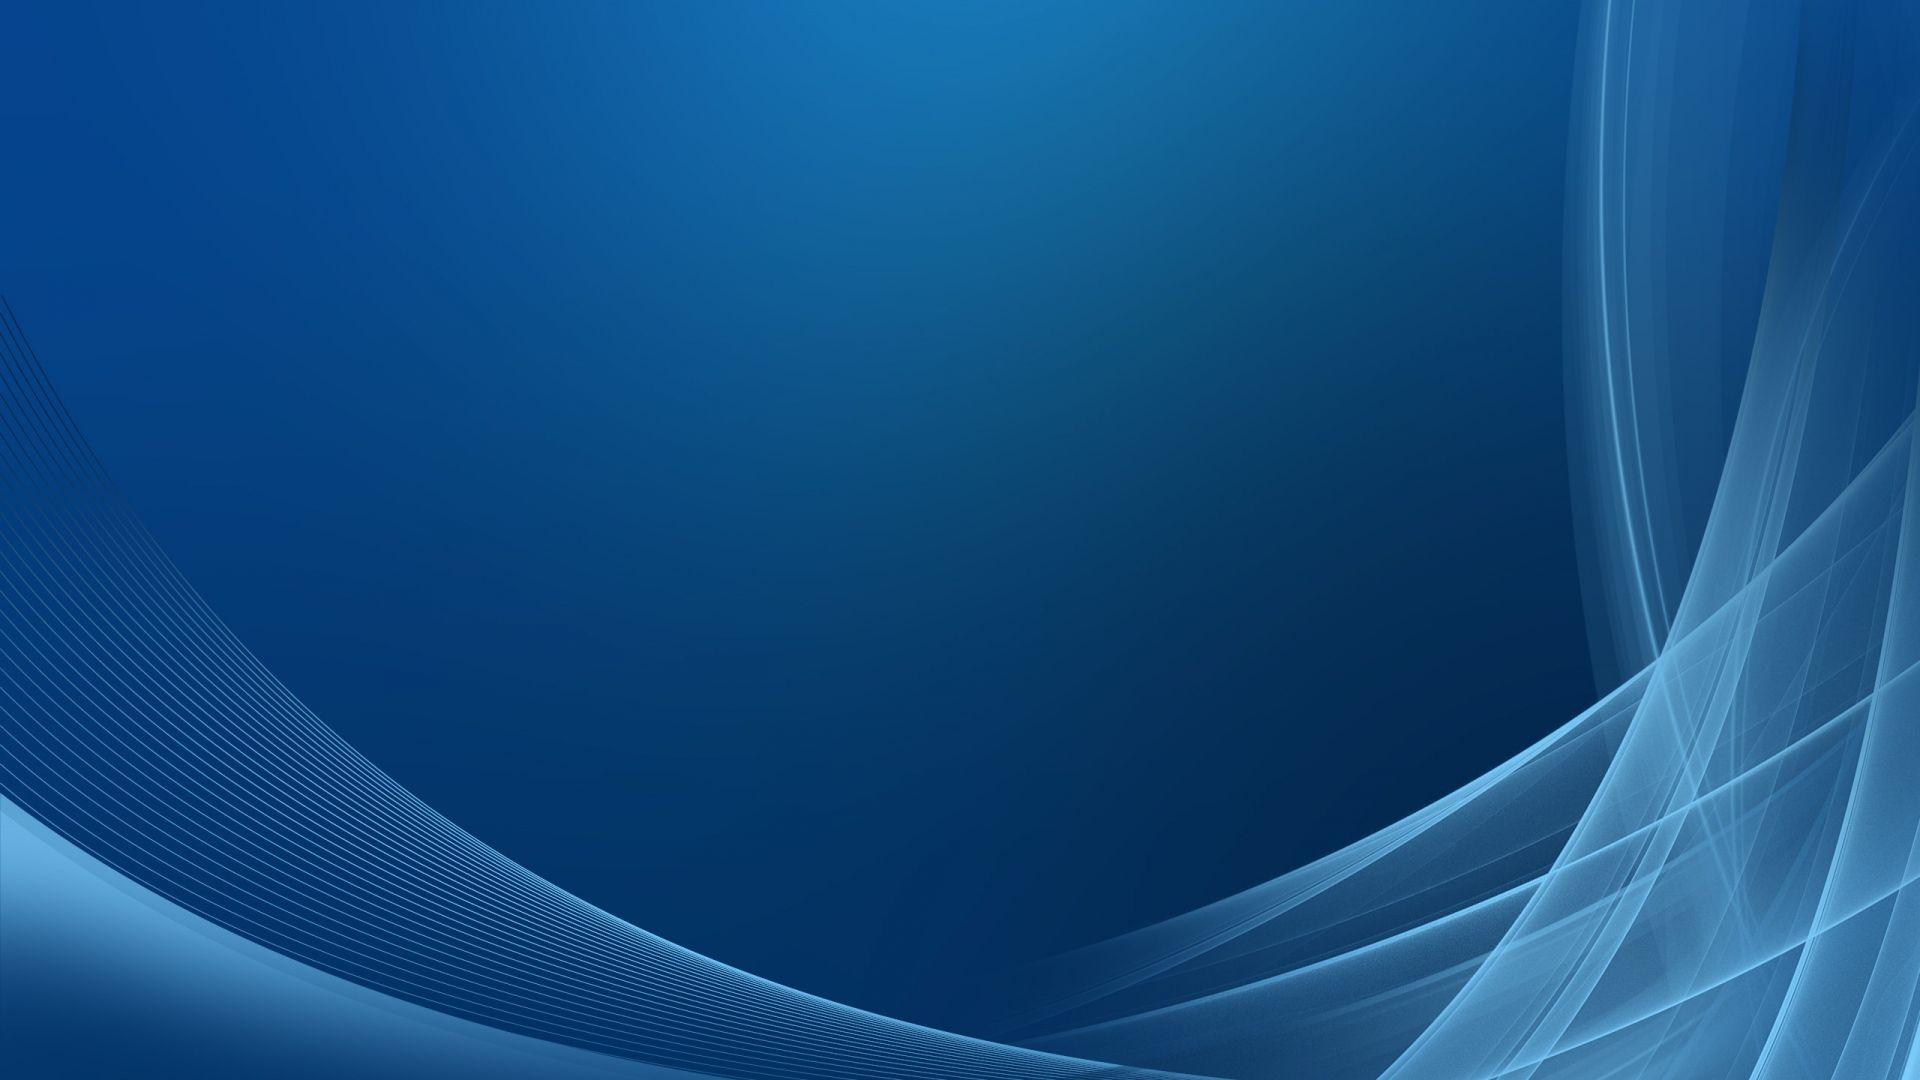 Blue Line full hd wallpaper